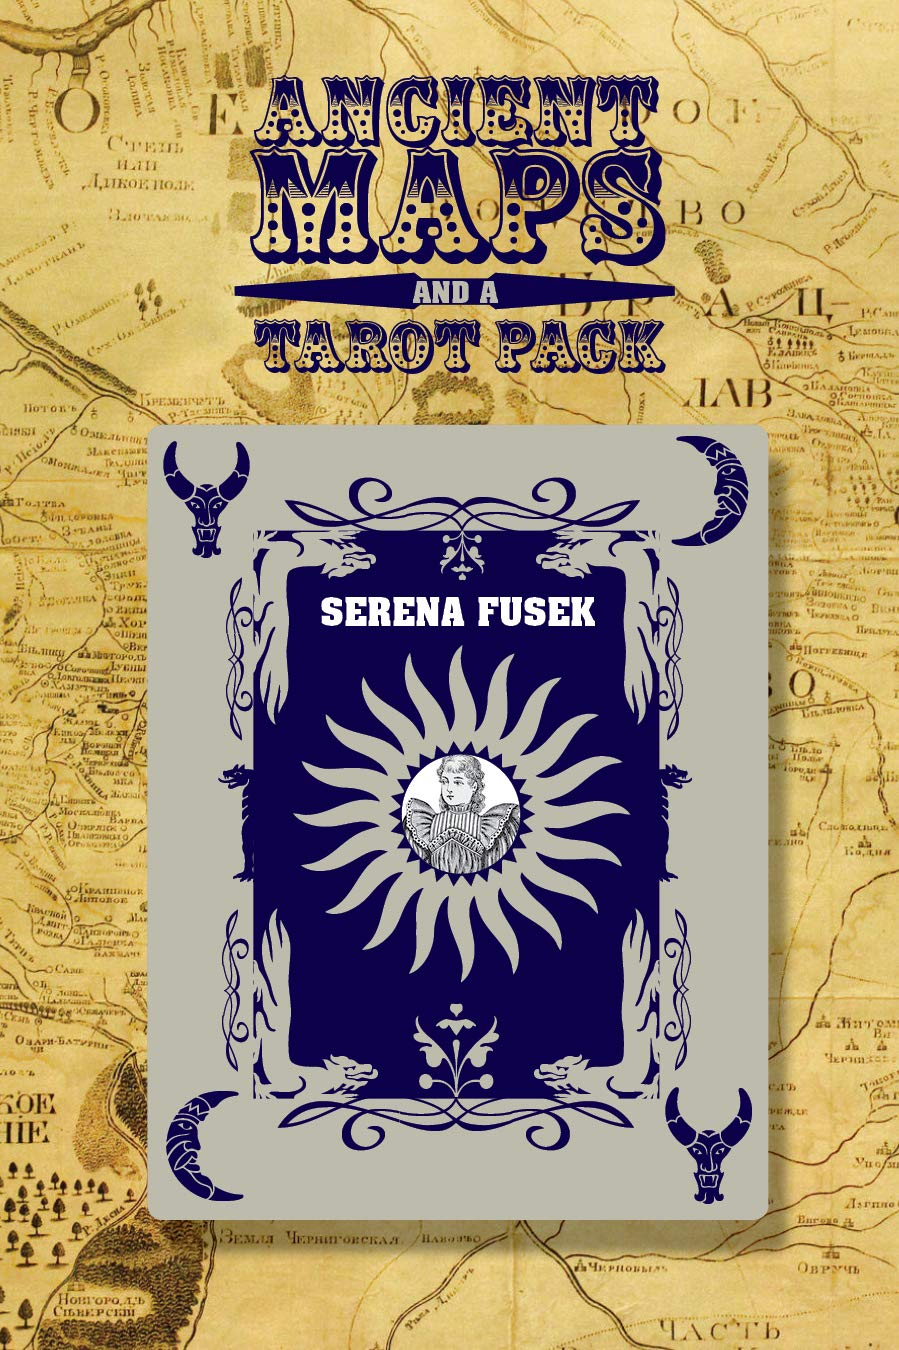 Ancient Maps and a Tarot Pack Bitter Oleander Press Library of Poetry Award: Amazon.es: Fusek, Serena: Libros en idiomas extranjeros